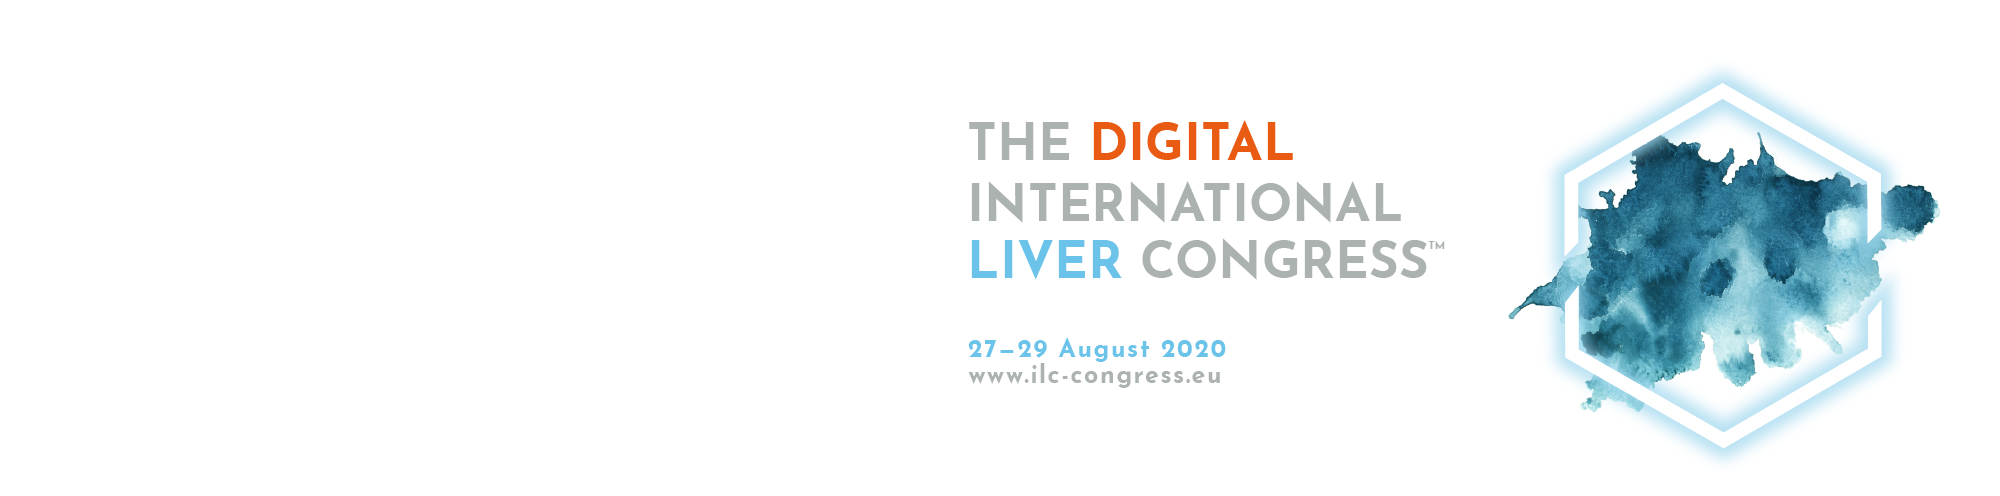 Digital ILC 2020